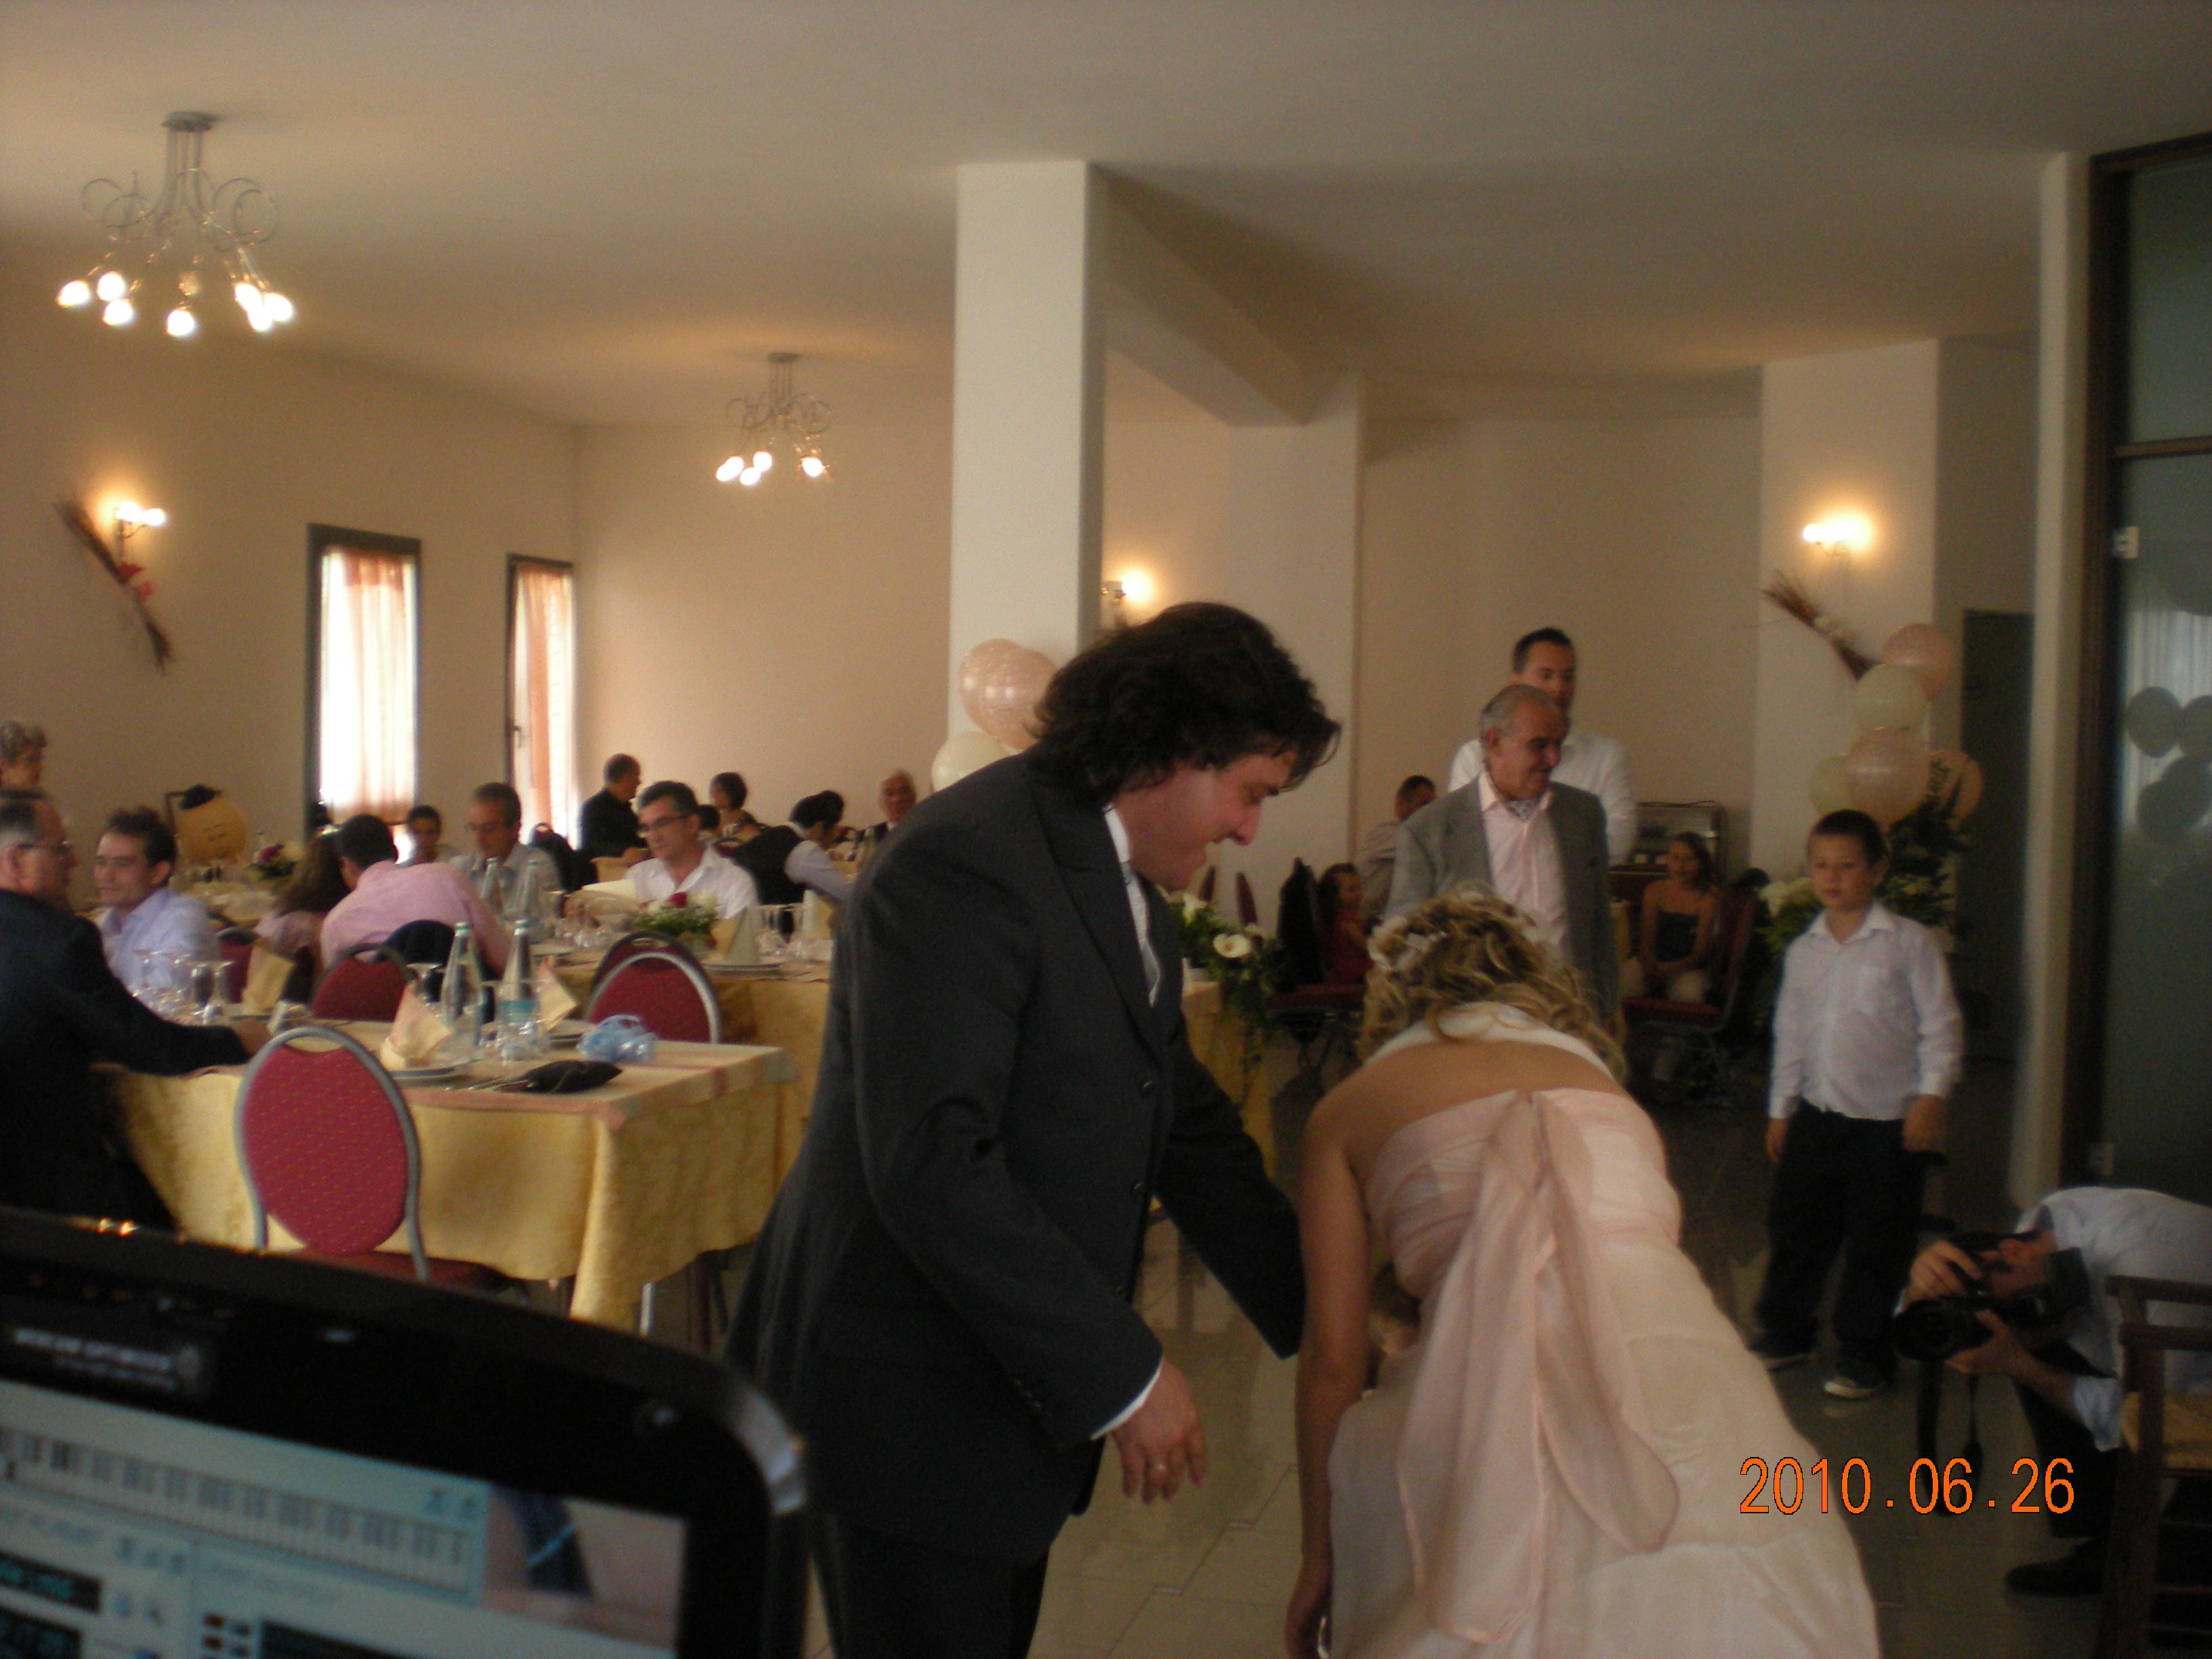 Francesco e Rosanna - 26.06.2010 - 005.JPG